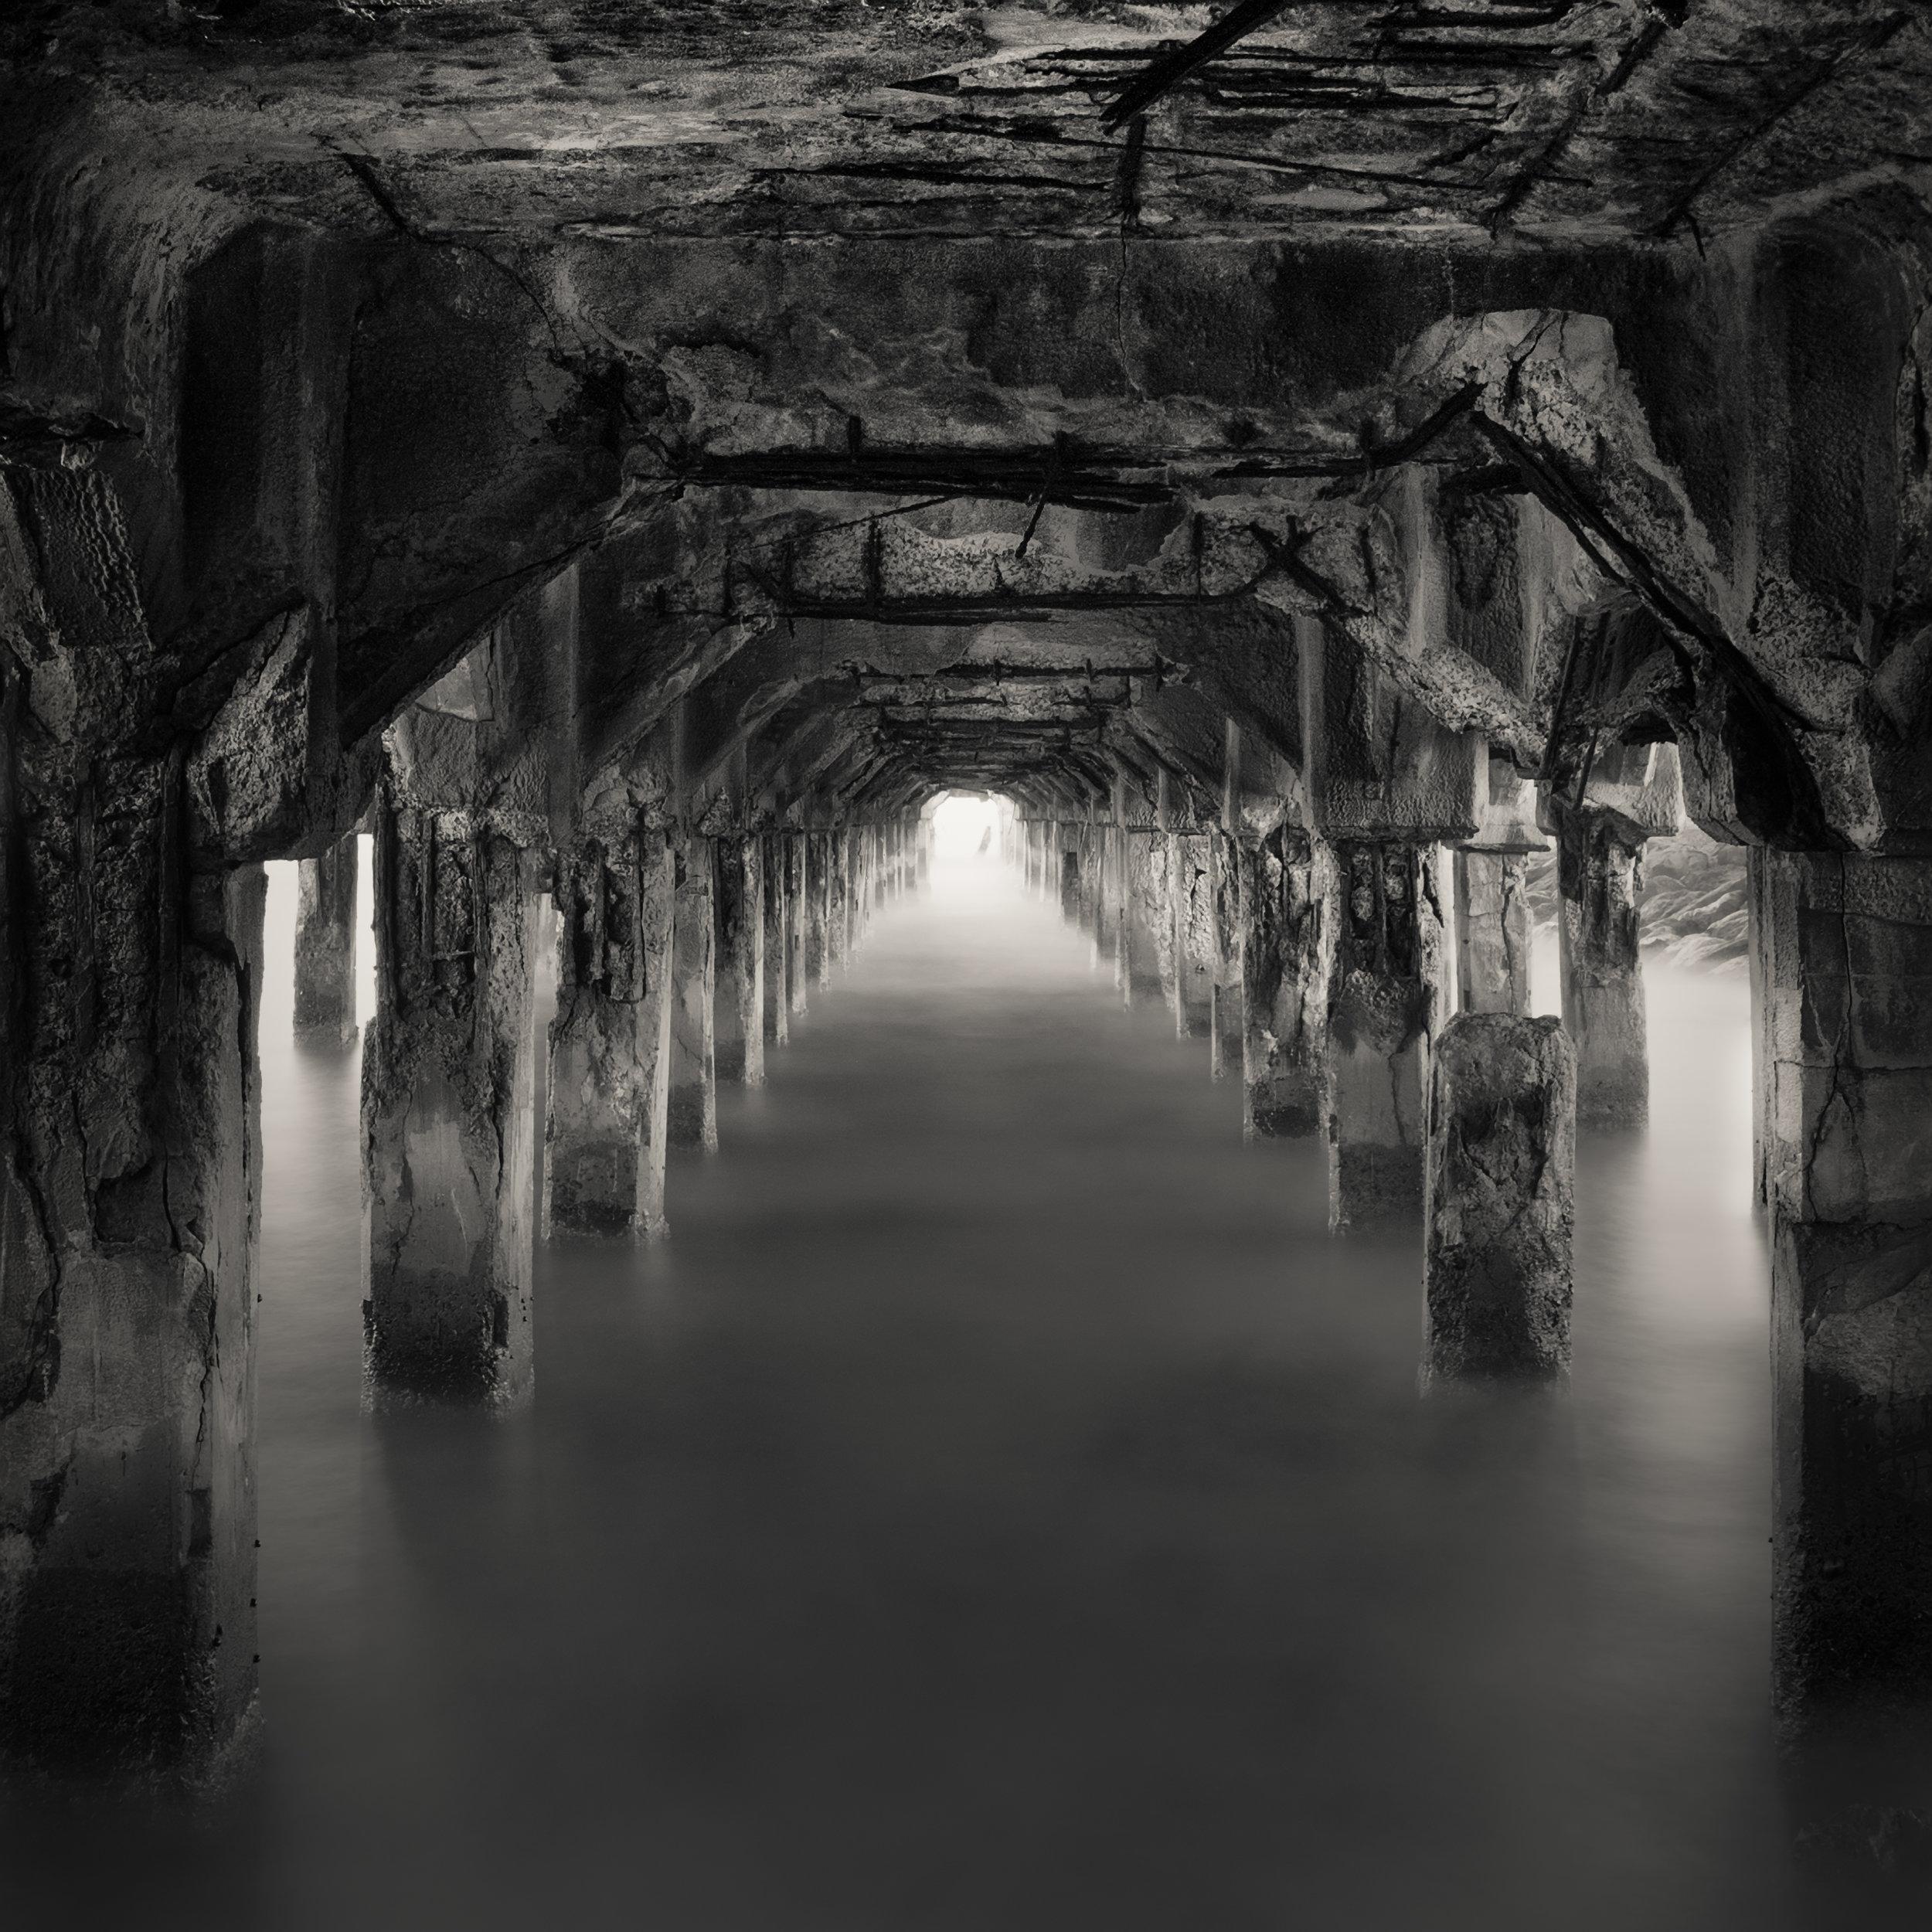 Maui Lahaina black white pier remains underneath catacombs